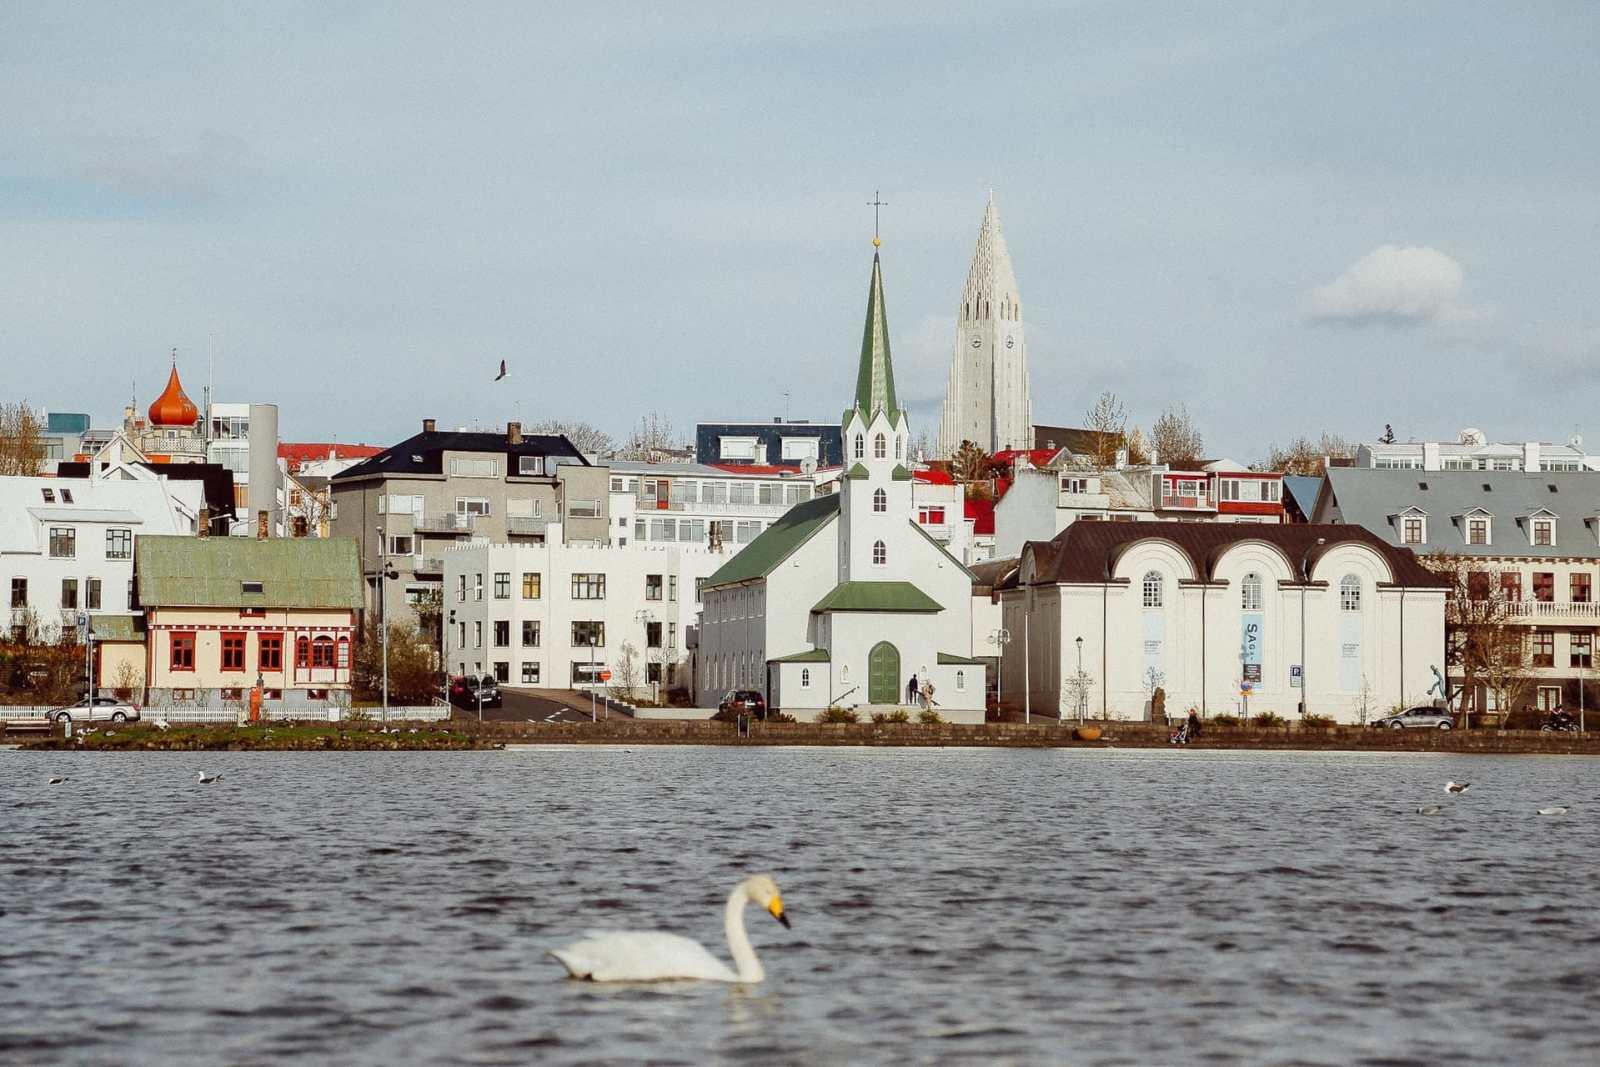 Las mejores zonas donde alojarse en Reykjavik, Islandia